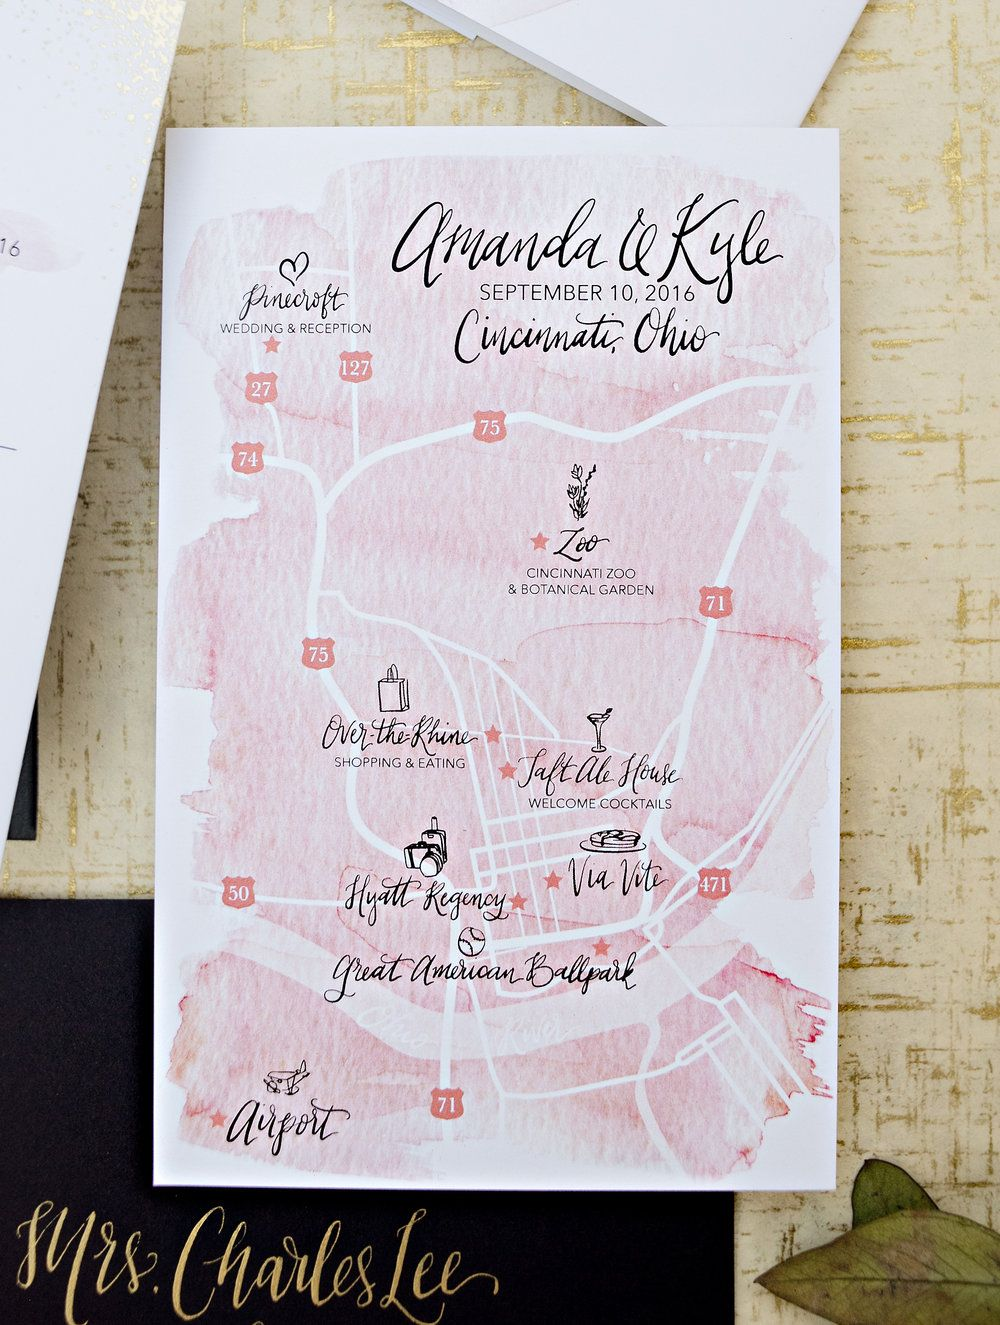 Pin by Audrey Kell on Invitations | Pinterest | Wedding, Weddings ...